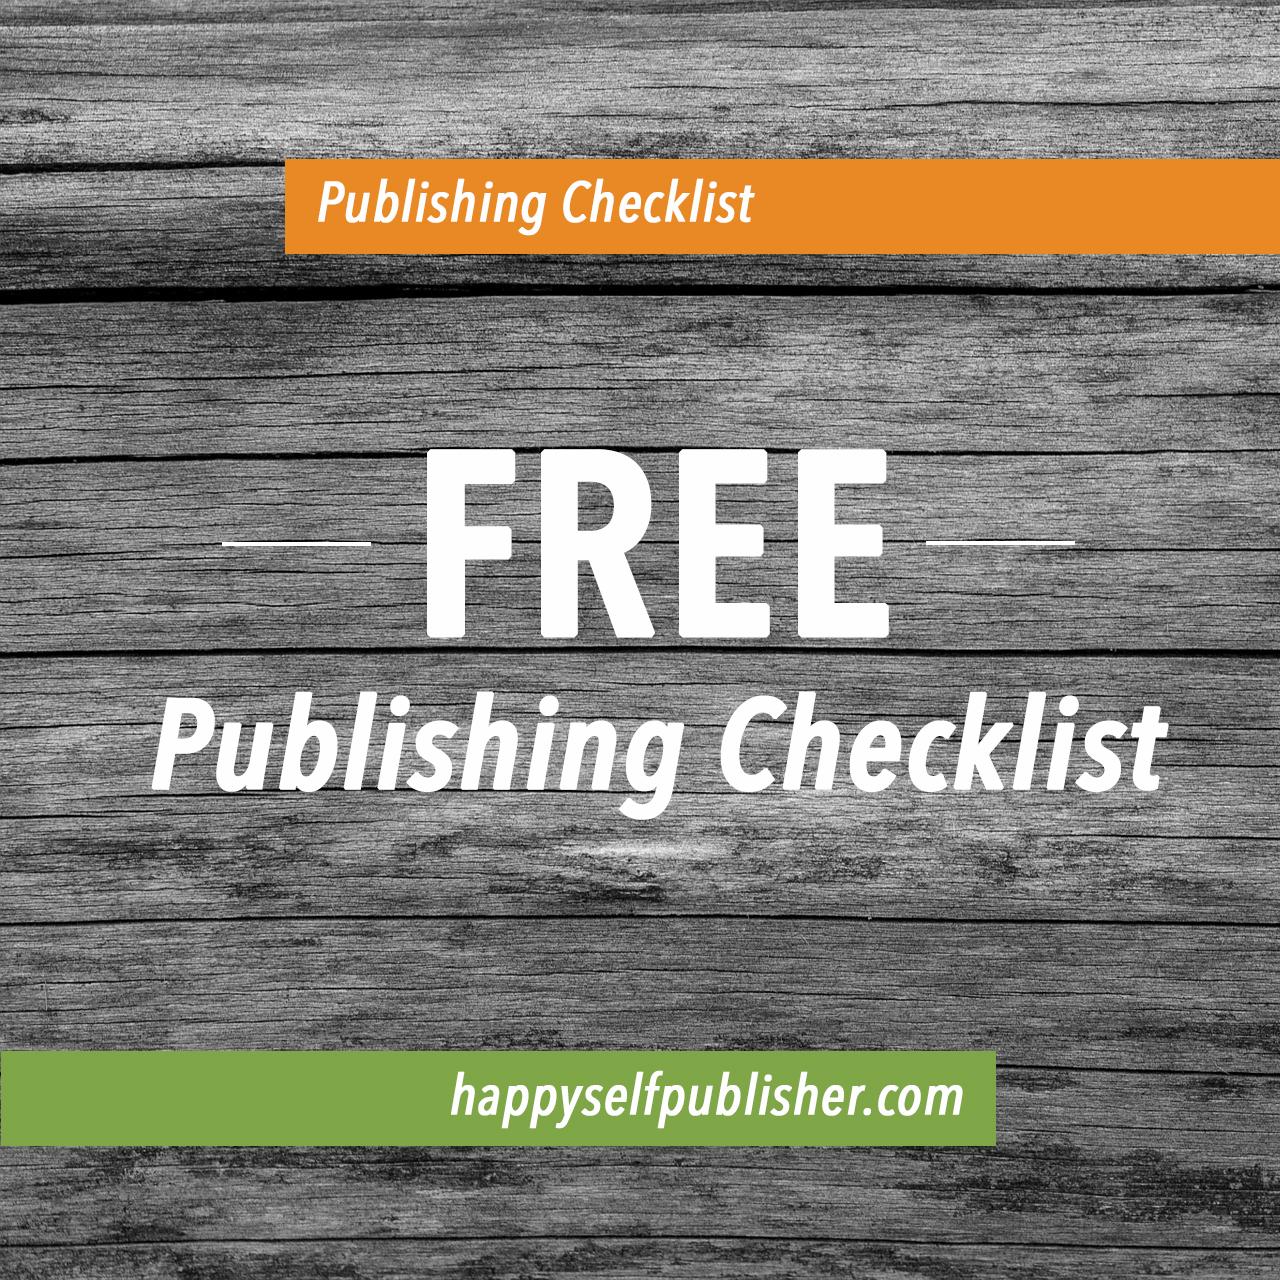 Publishing Checklist